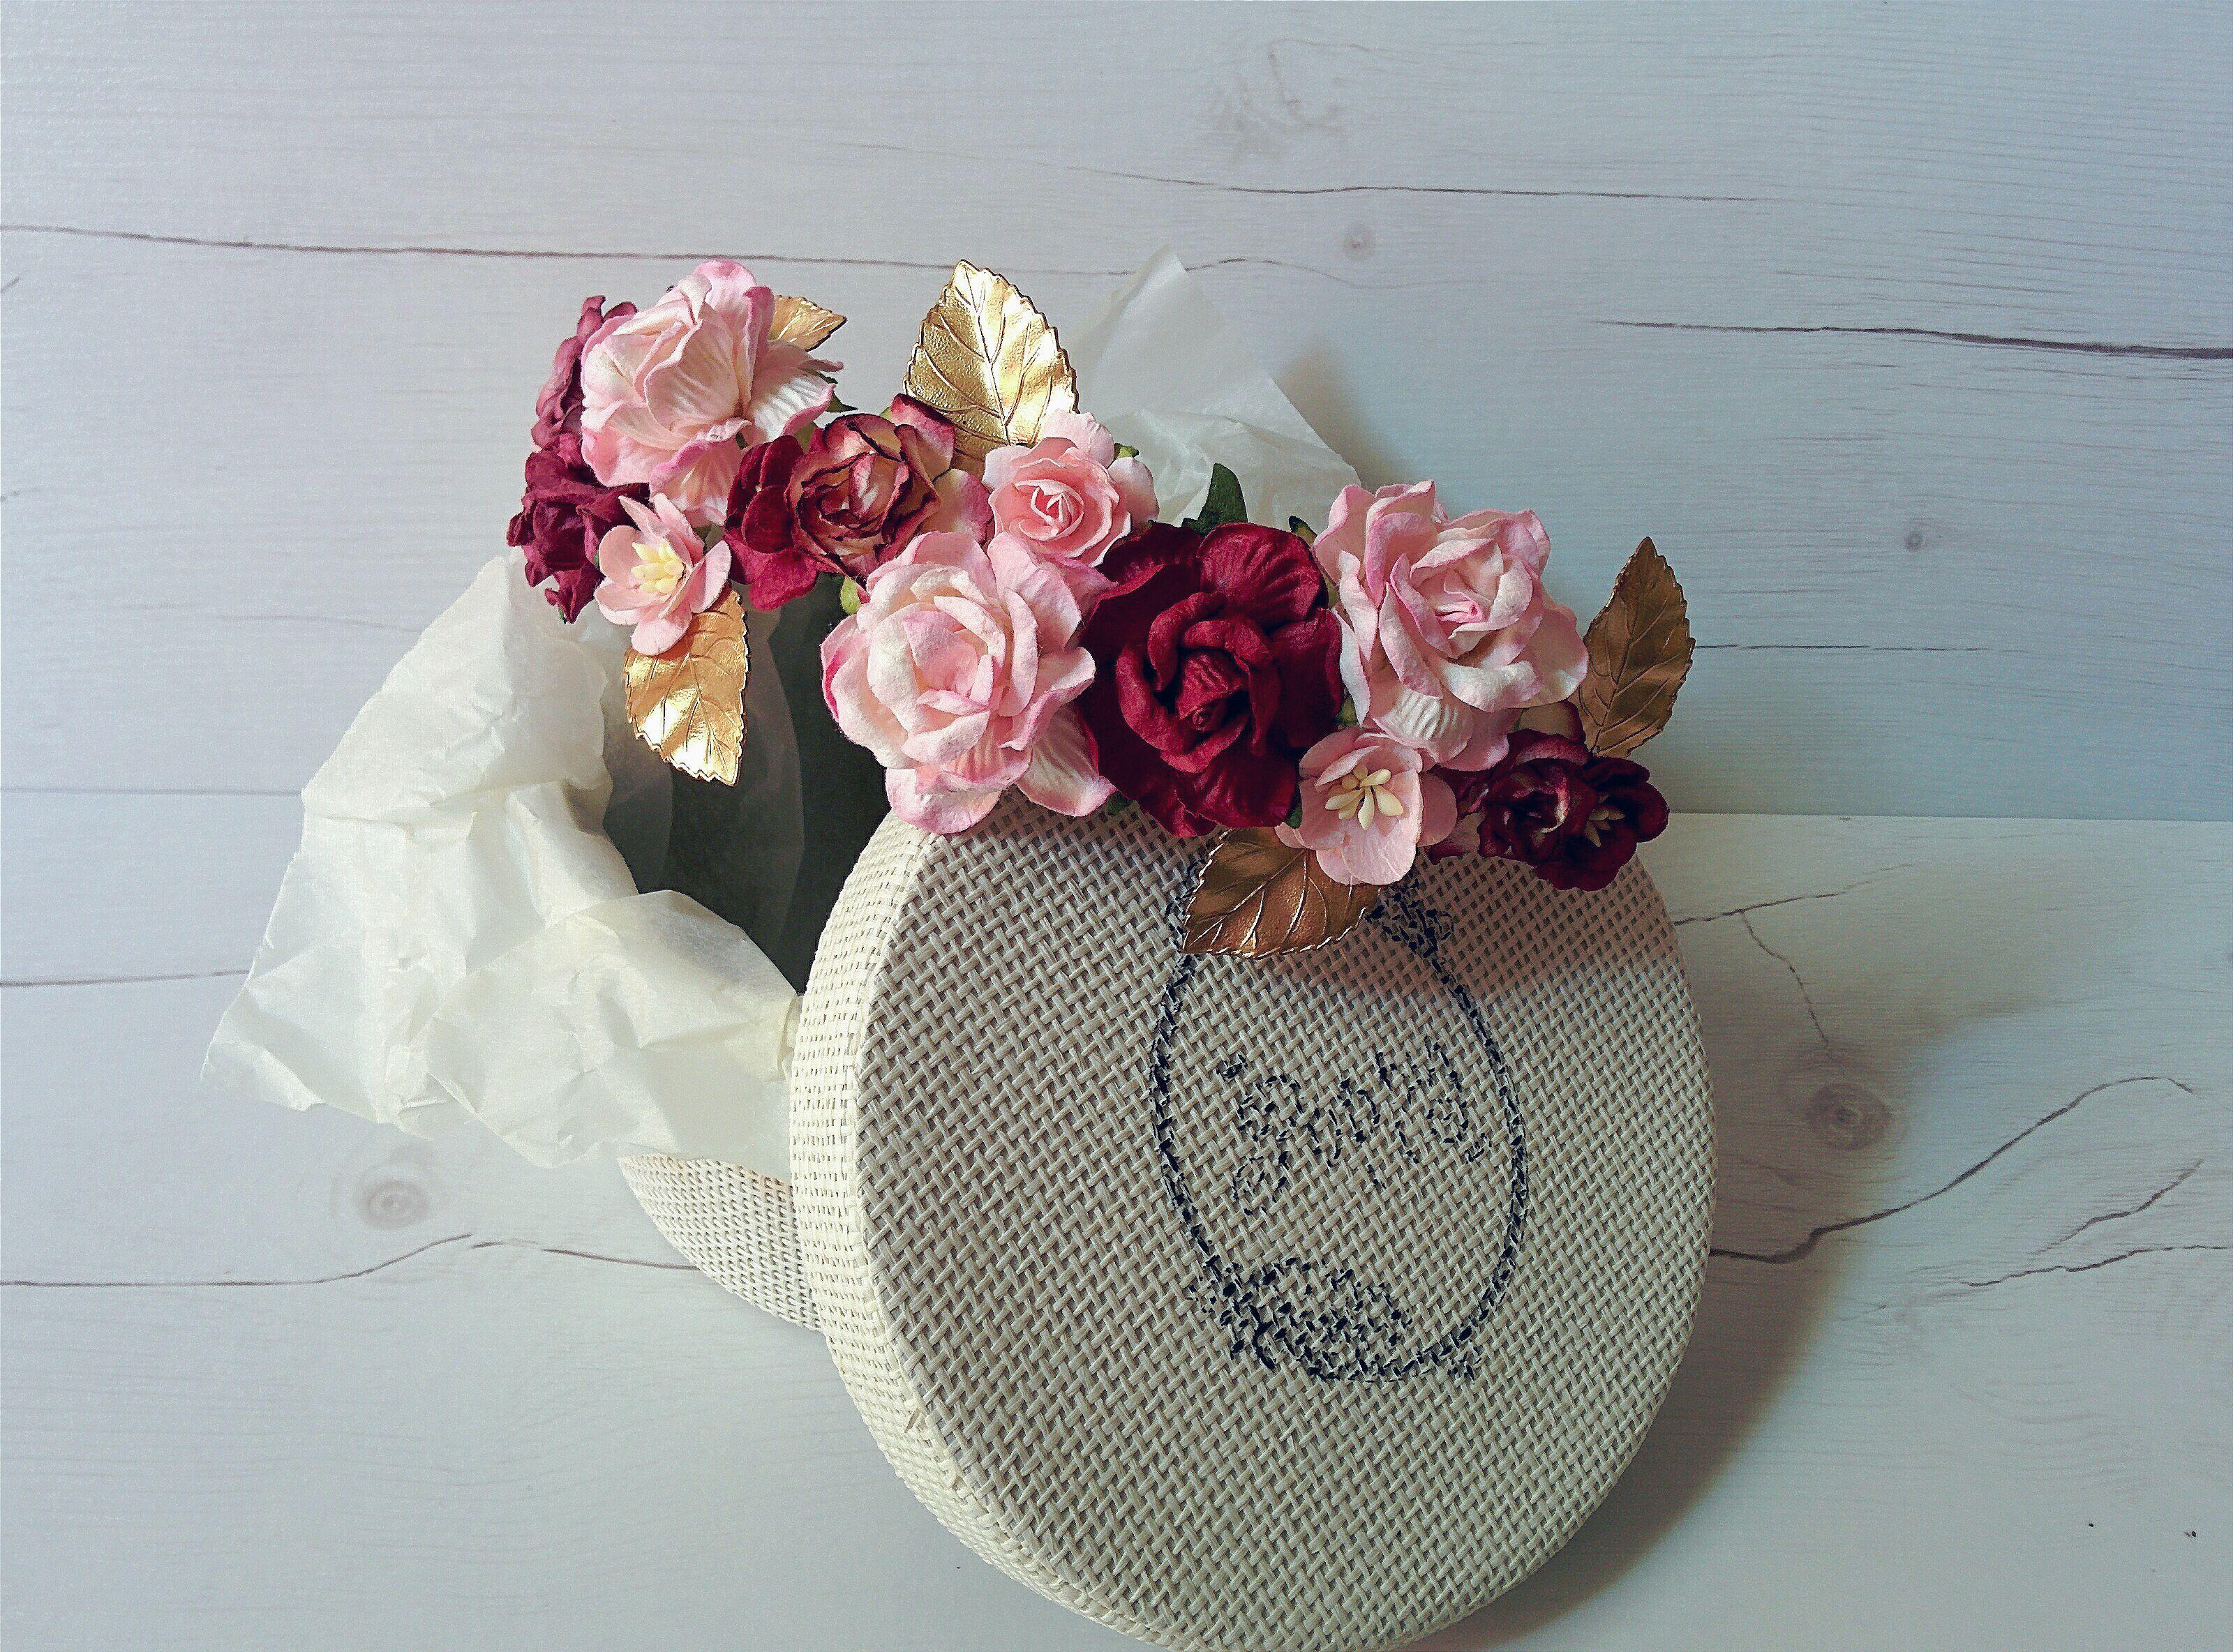 Custom made floral crown burgundy and pink hues with natural brass leaves <3 #custom #flowercrown #flowers #crown #floral #headpiece #bridal #bride #wedding #guest #handmade